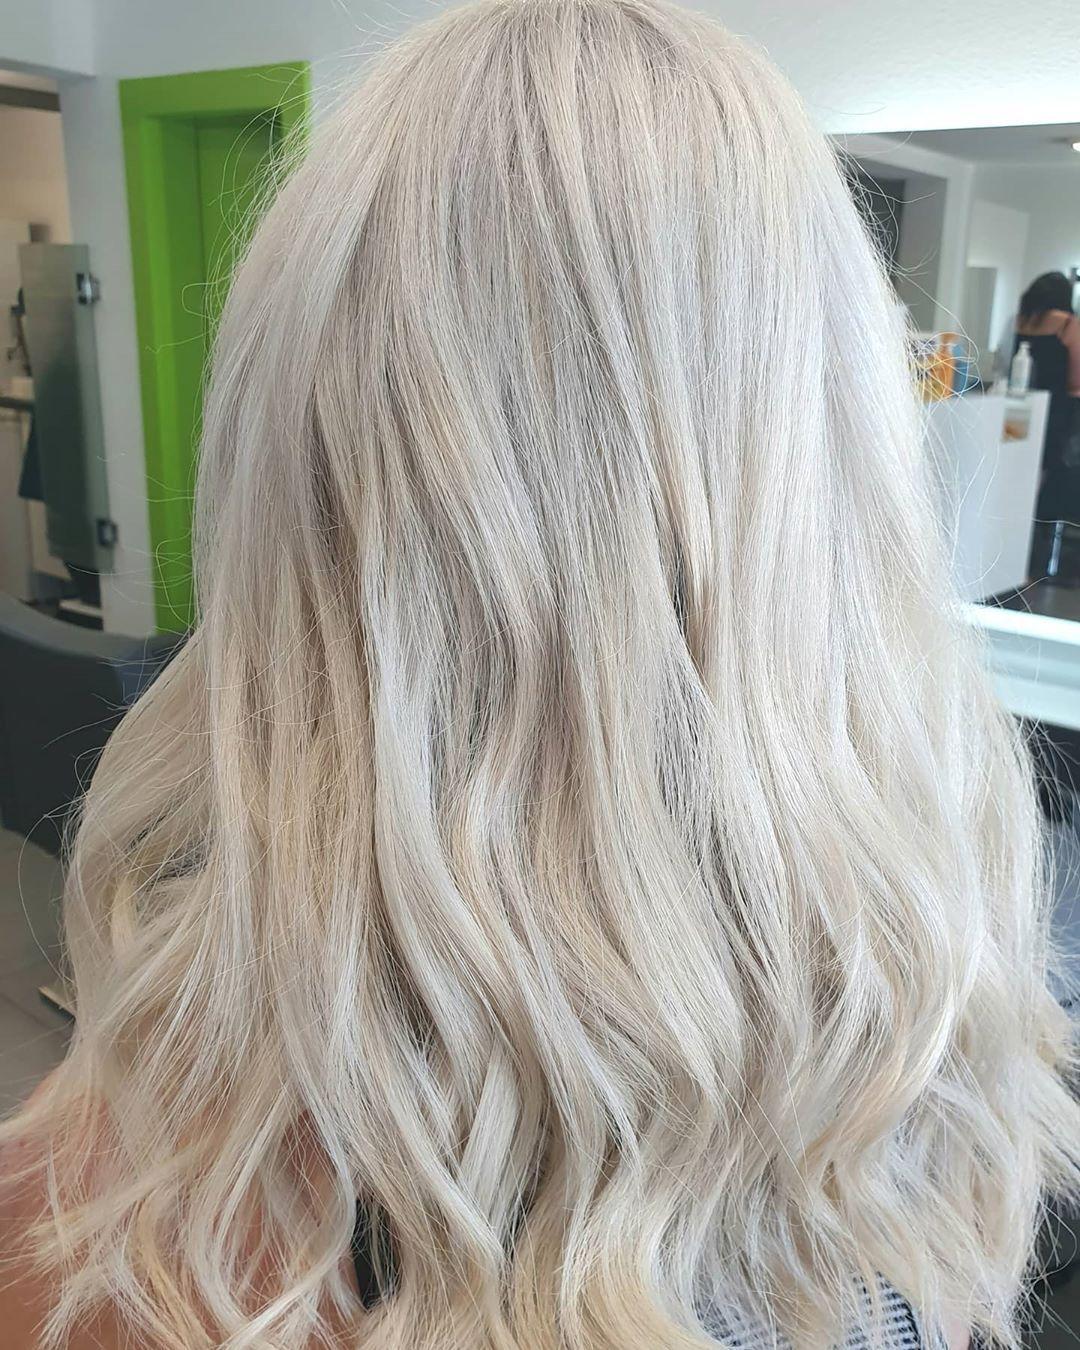 Pin By Ina Cedivav On Blonde Hair Bleached Hair Blonde Hair Coiffure